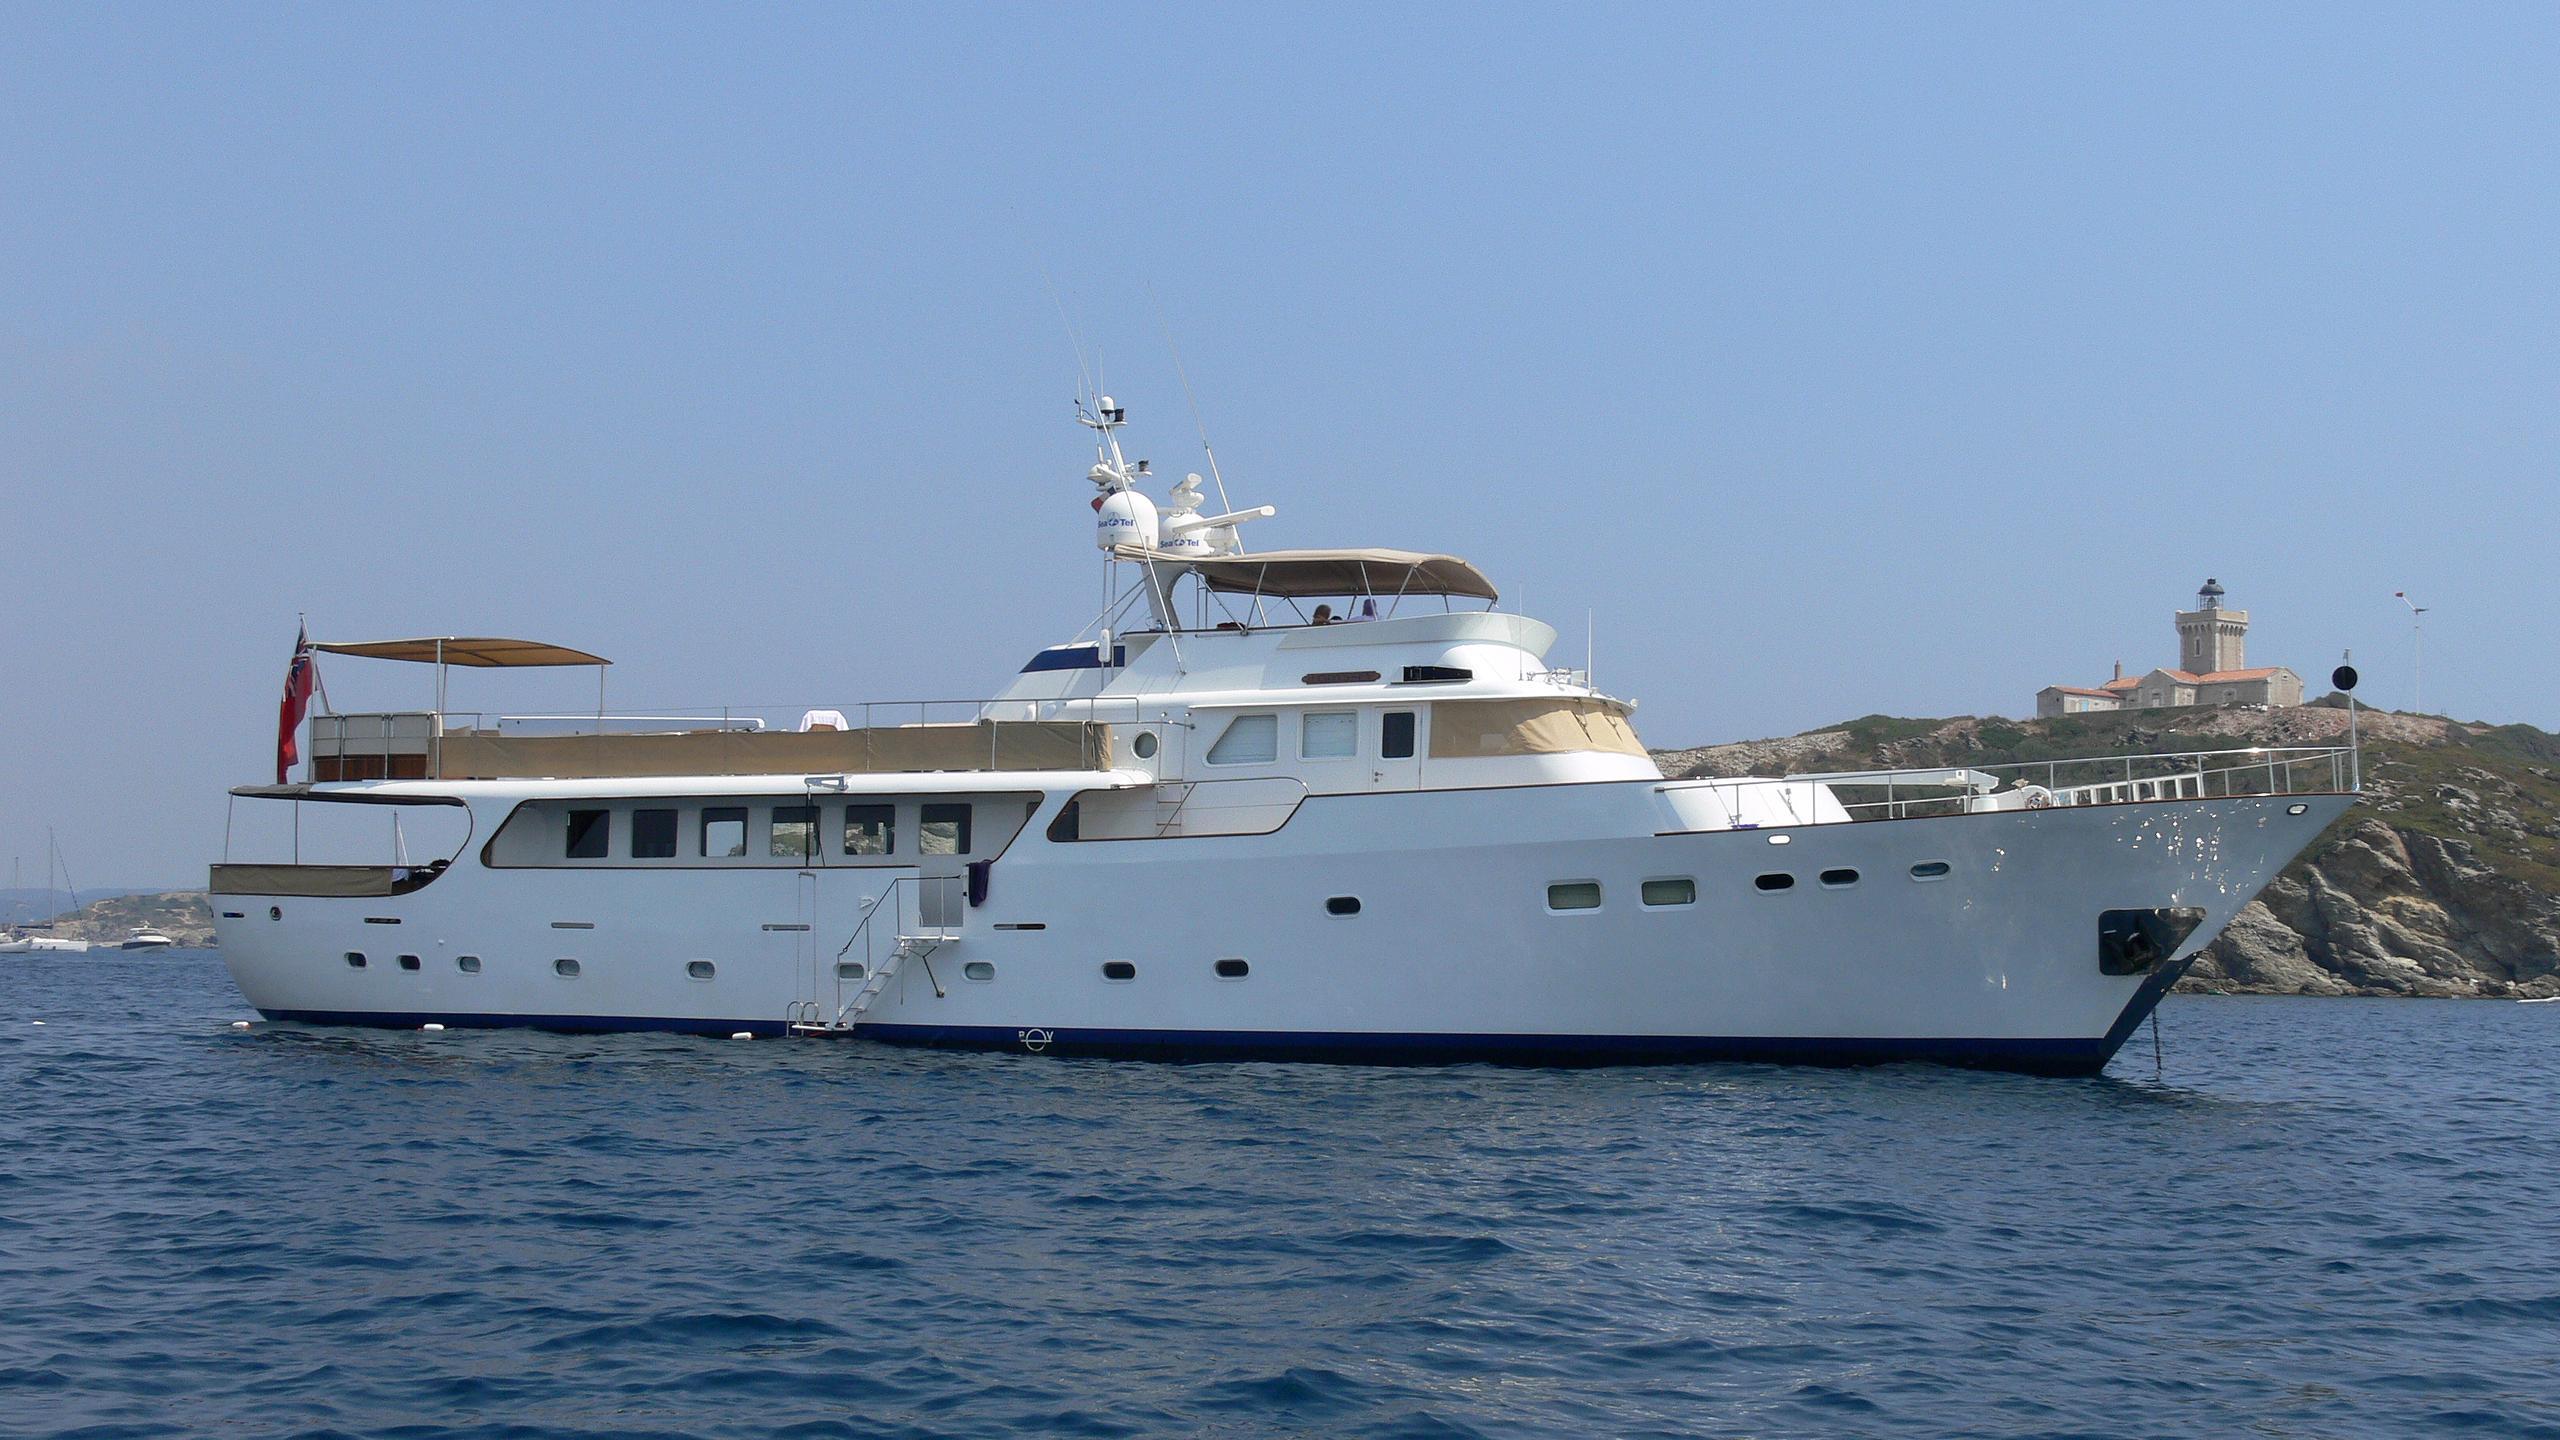 il-odyssey-motor-yacht-benetti-mediterraneo-1967-33m-profile